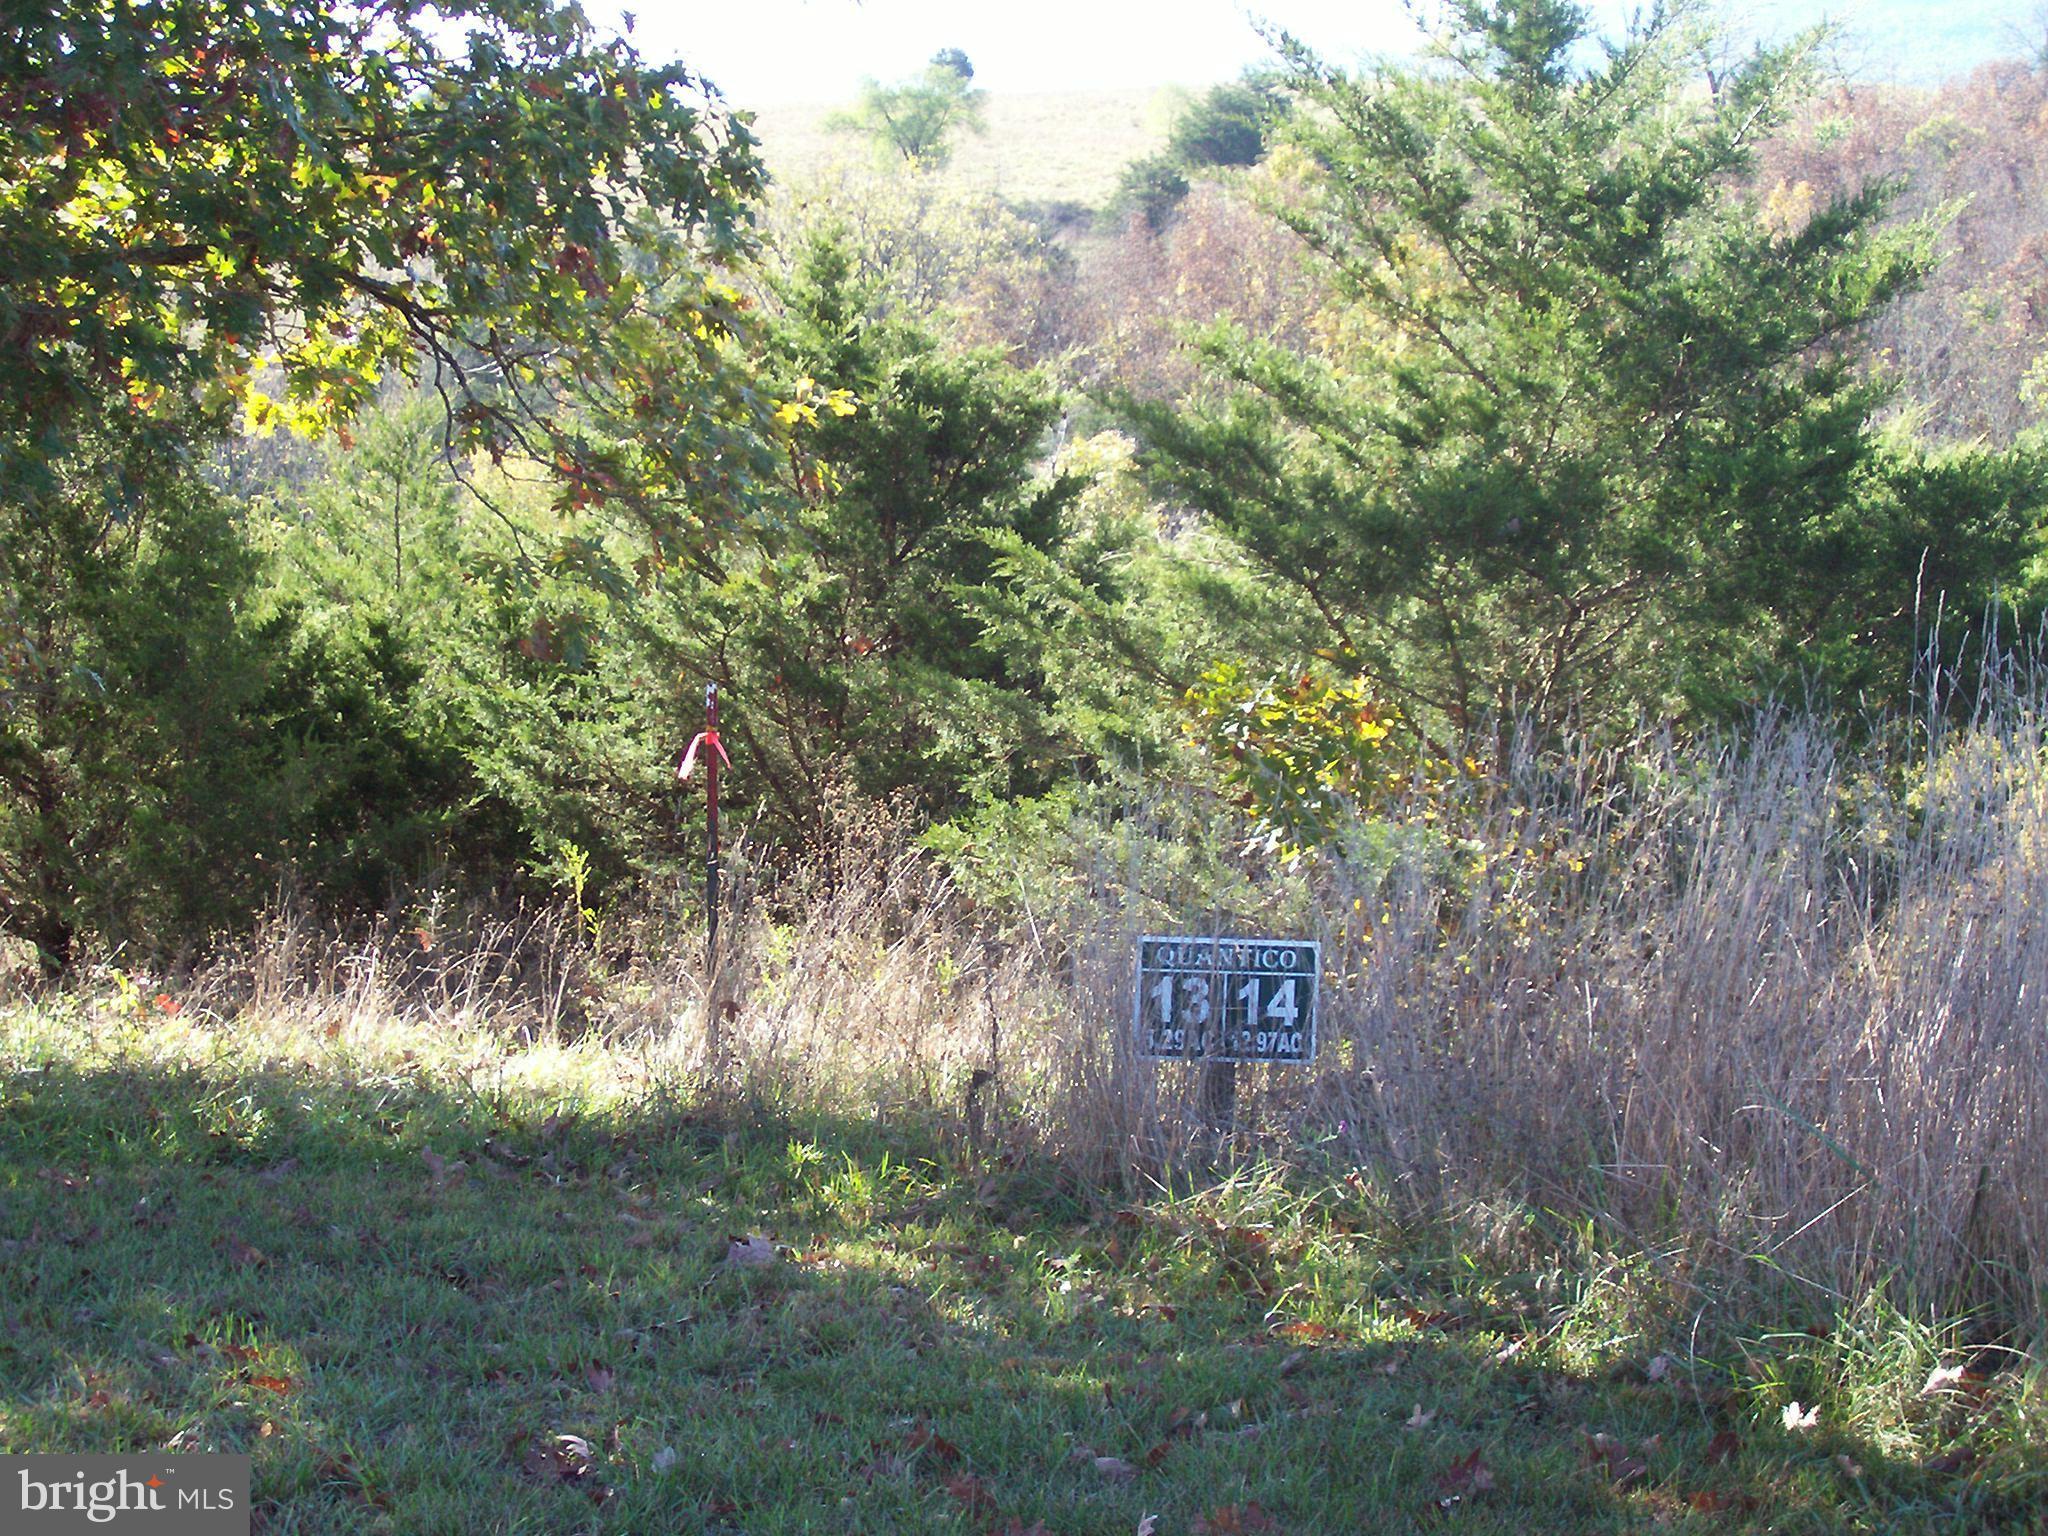 0 Quantico Trail, Cabins, WV 26855